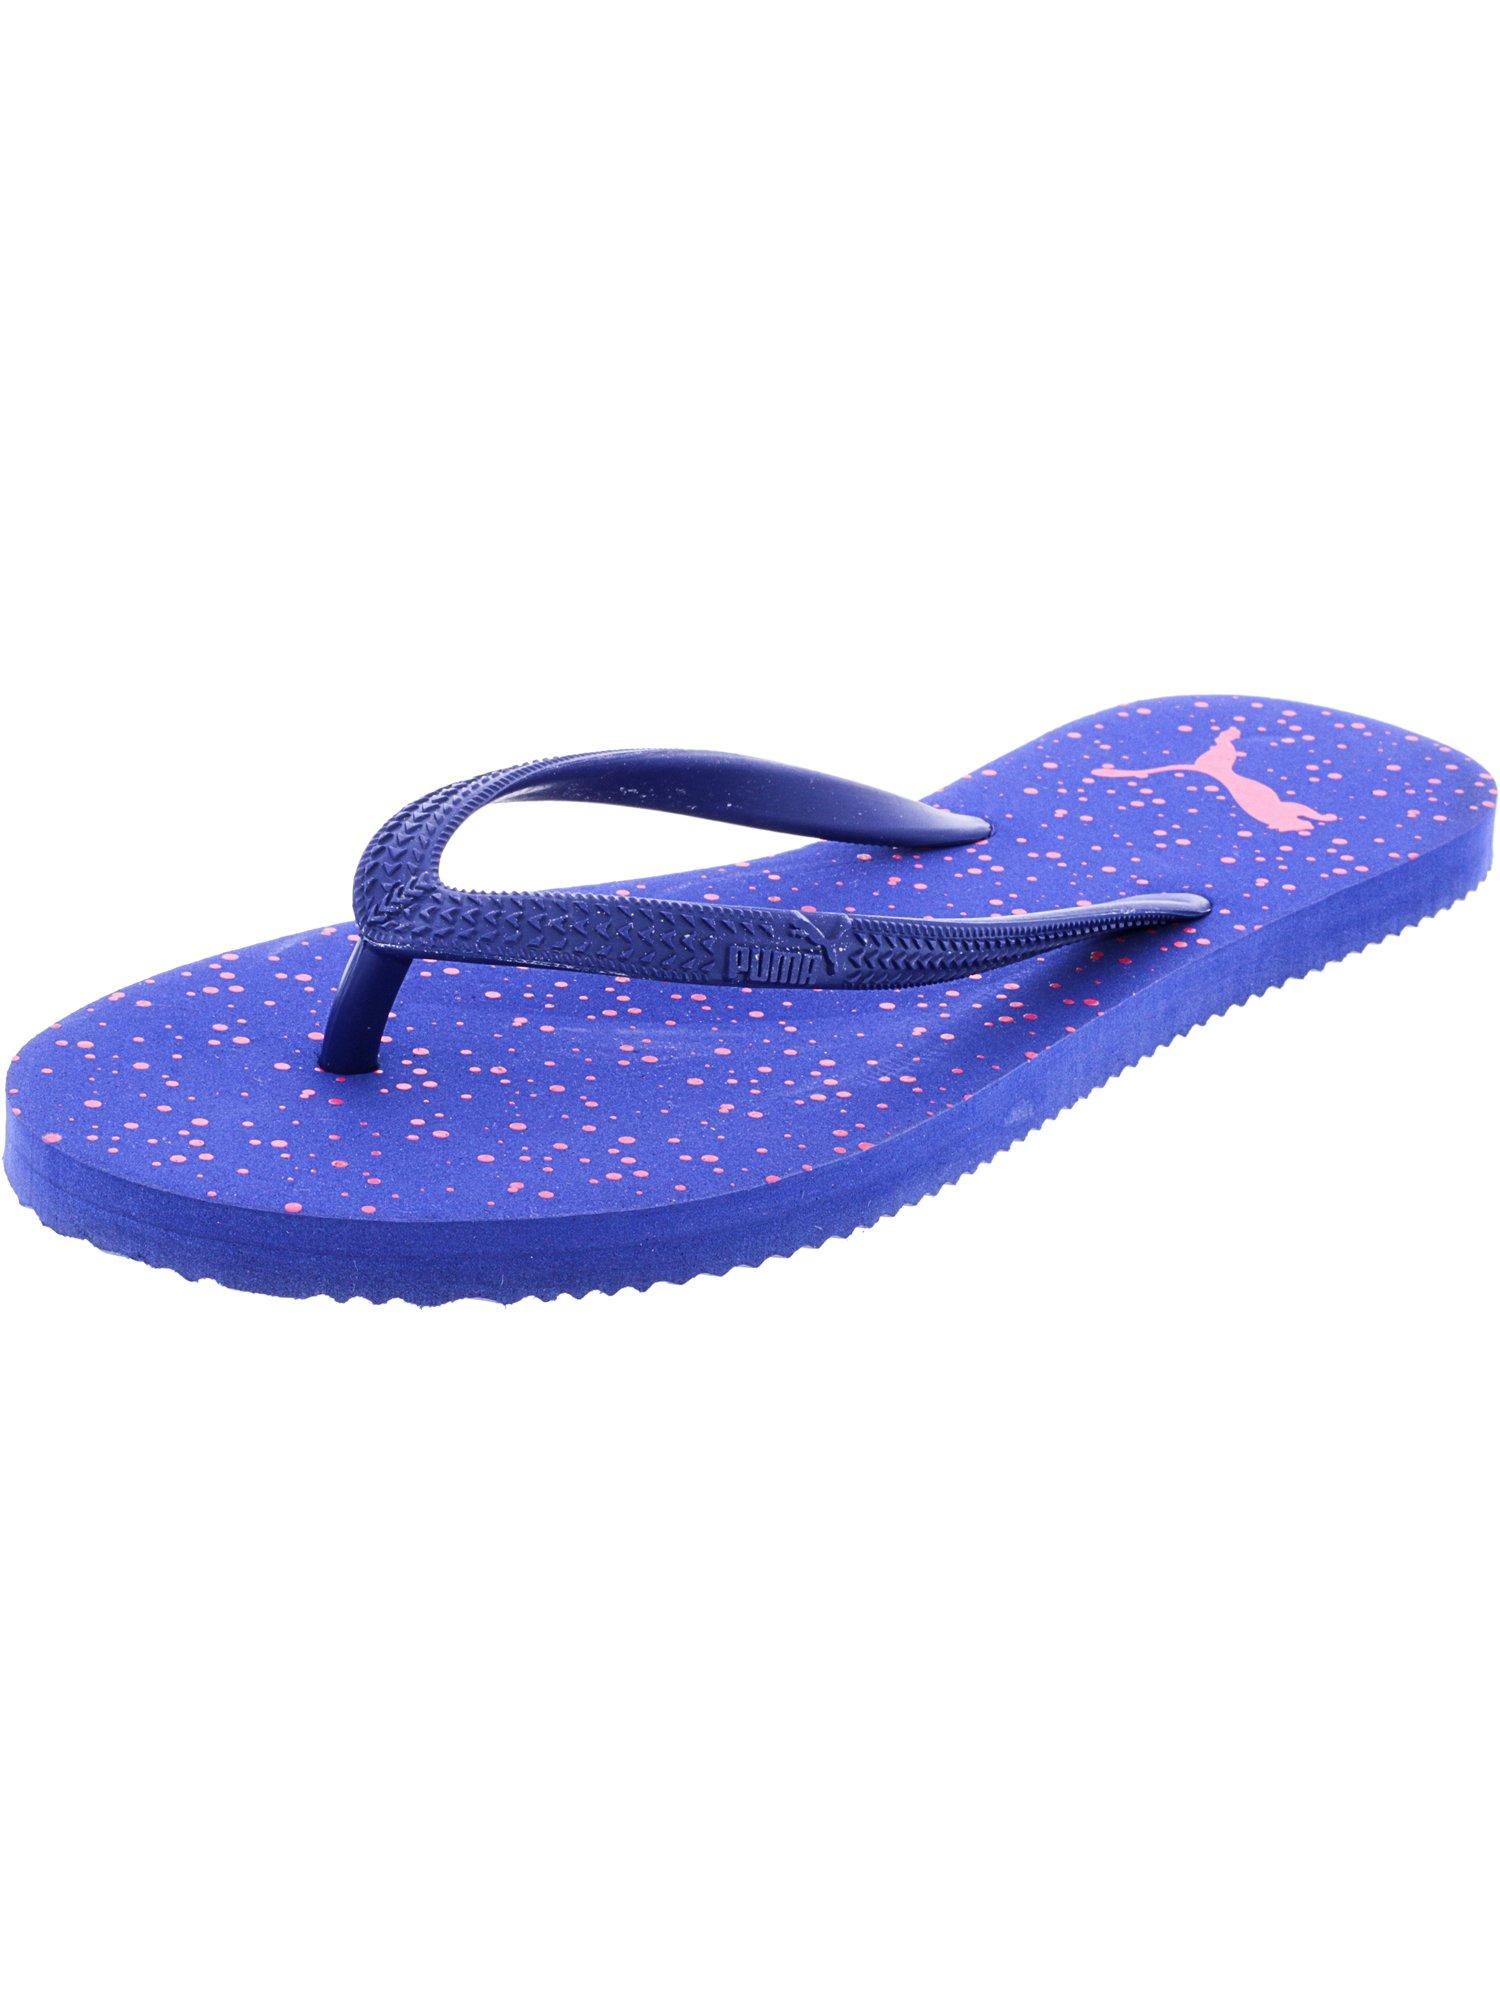 febb9da2cd6a Puma Women s First Flip Dots Mazarine Blue   Fandango Pink Sandal - 6.5M